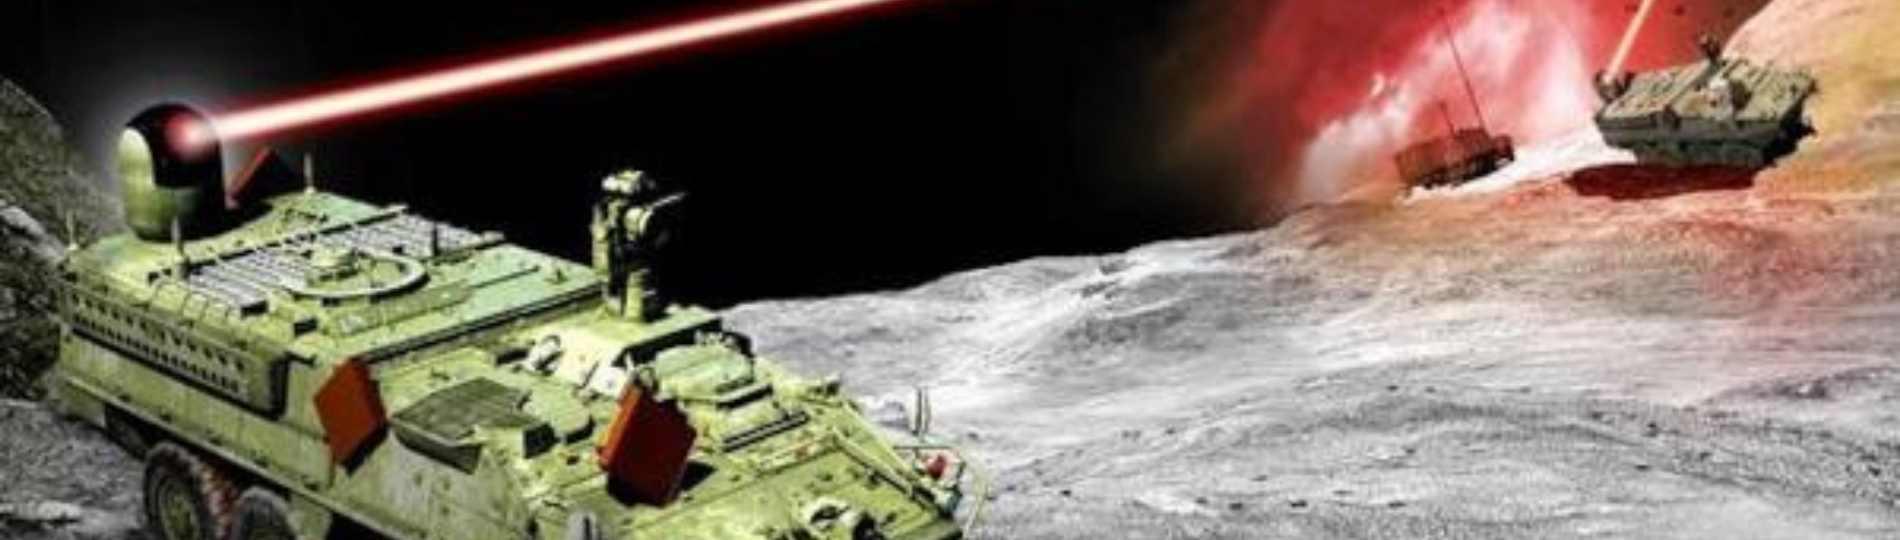 laser battalion